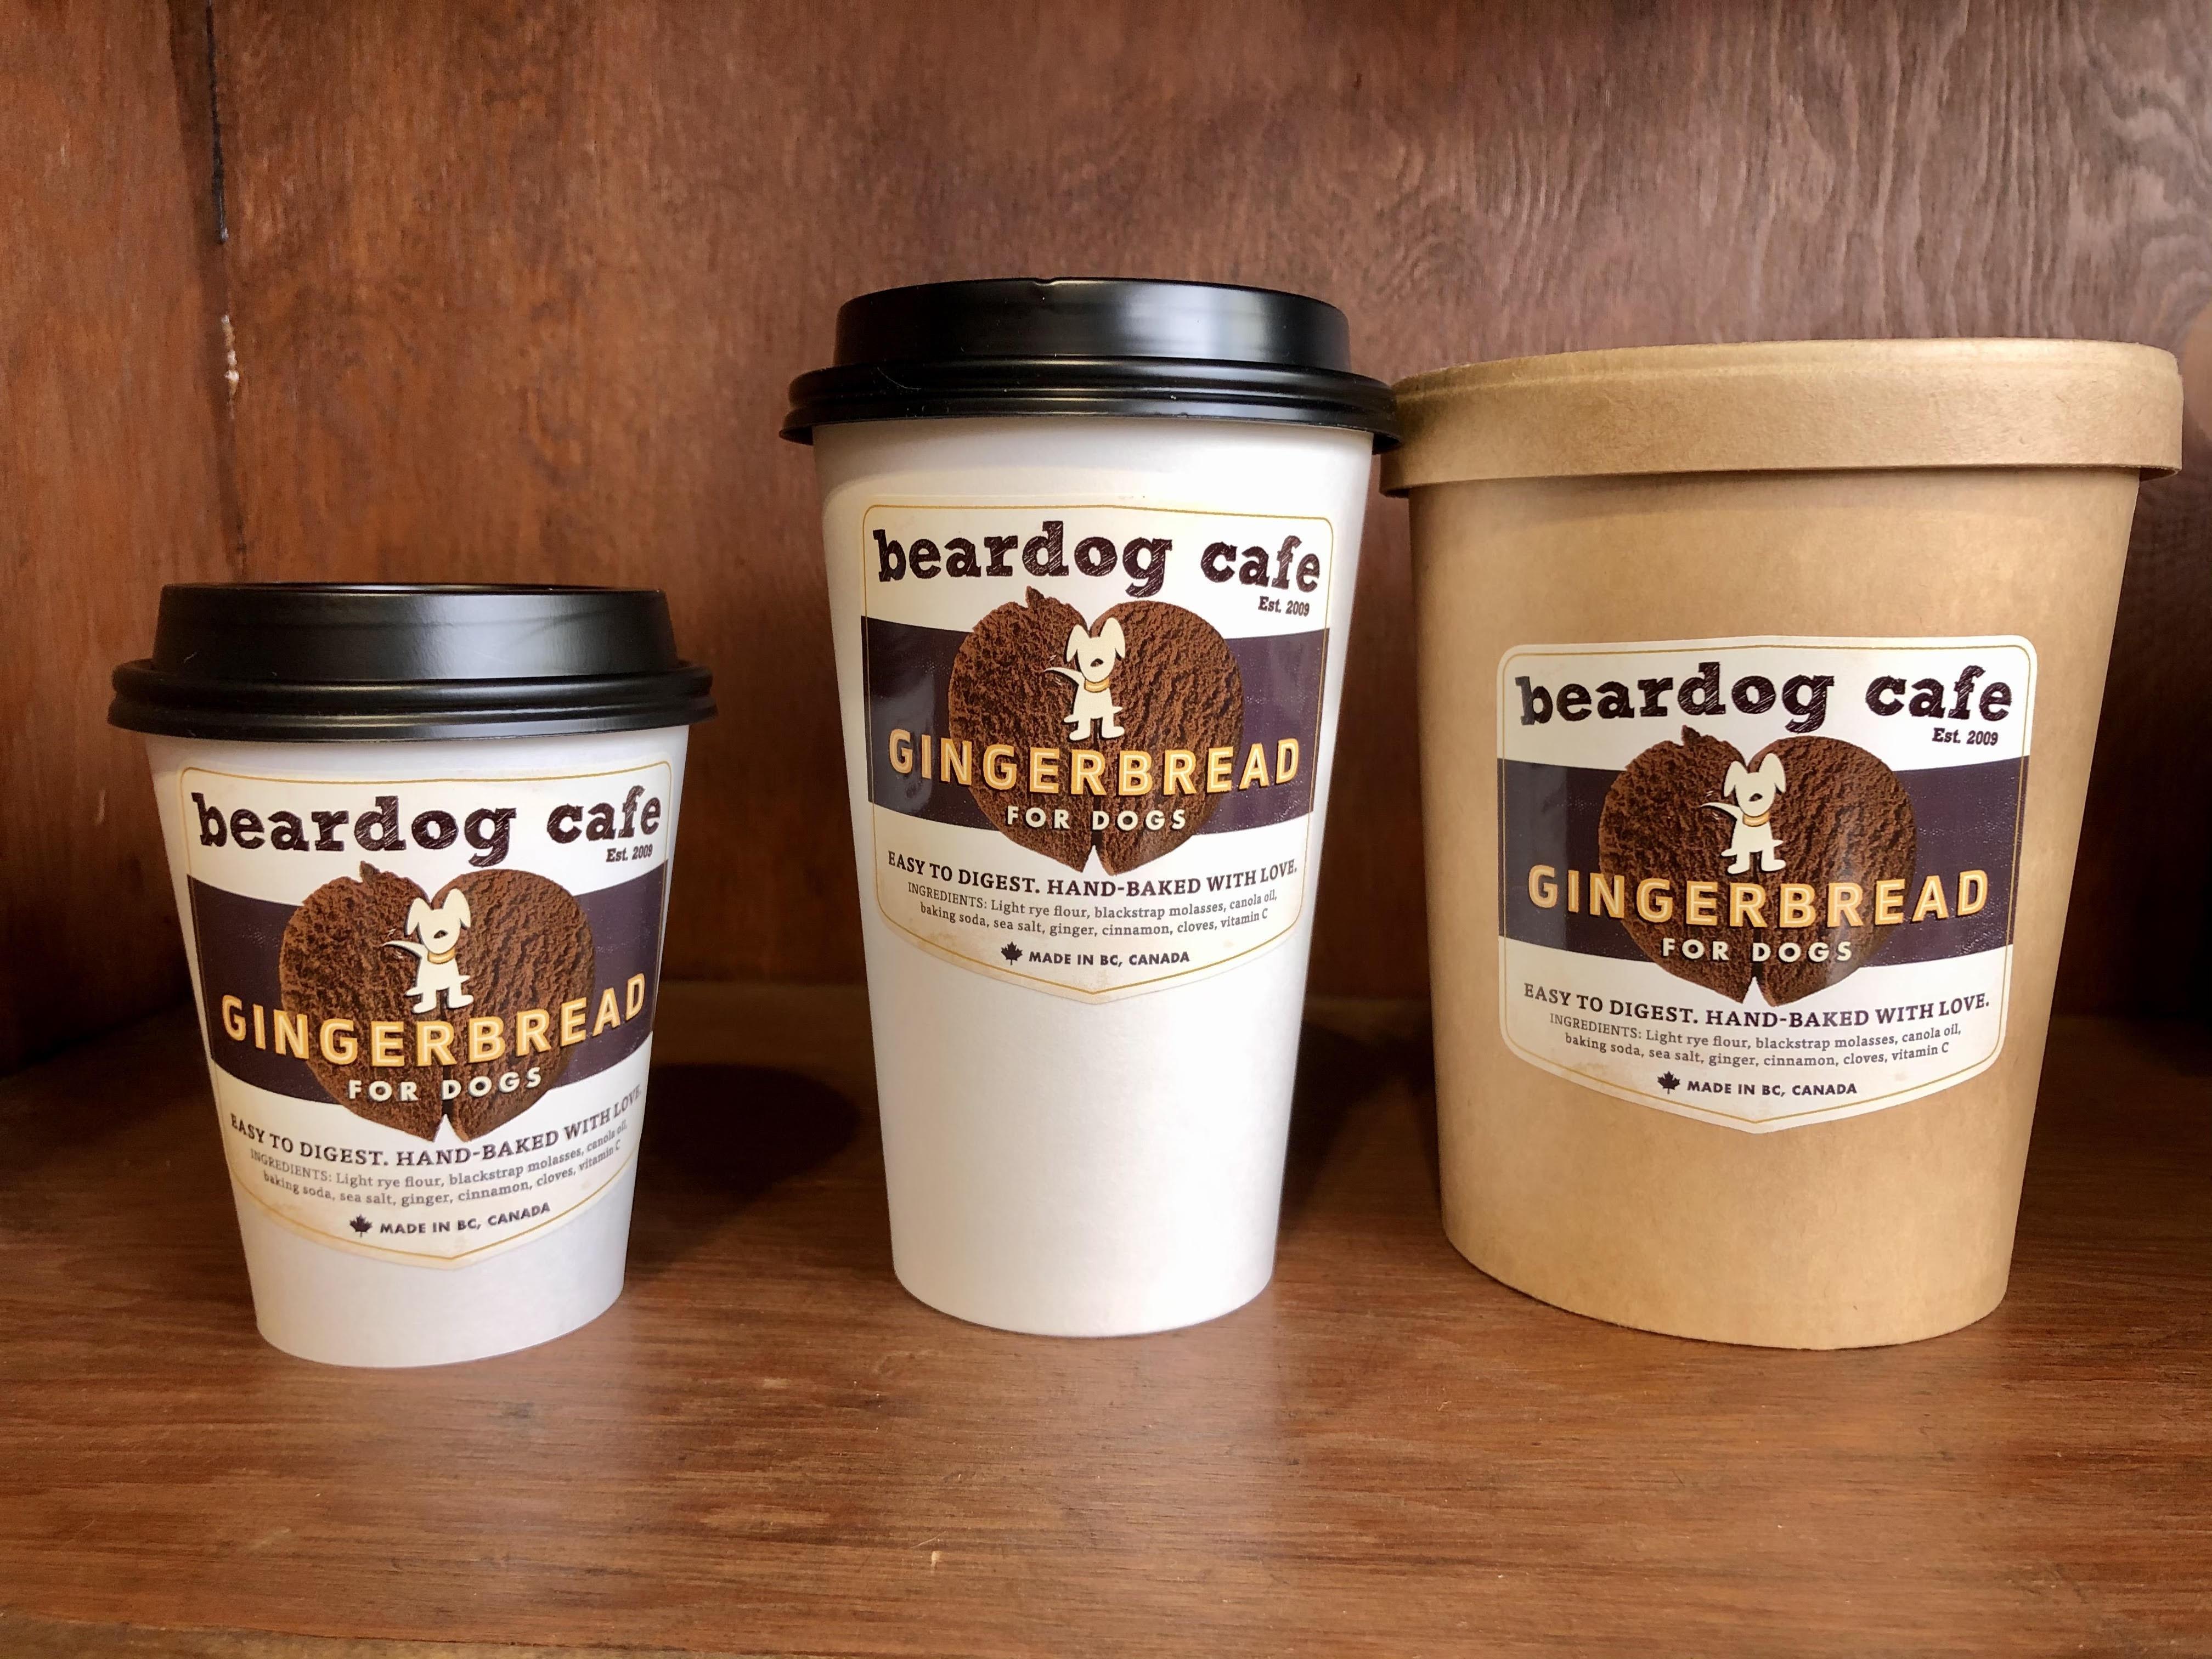 Beardog Cafe Pumpkin Gingerbread Cookies Dog Treats, 8-oz